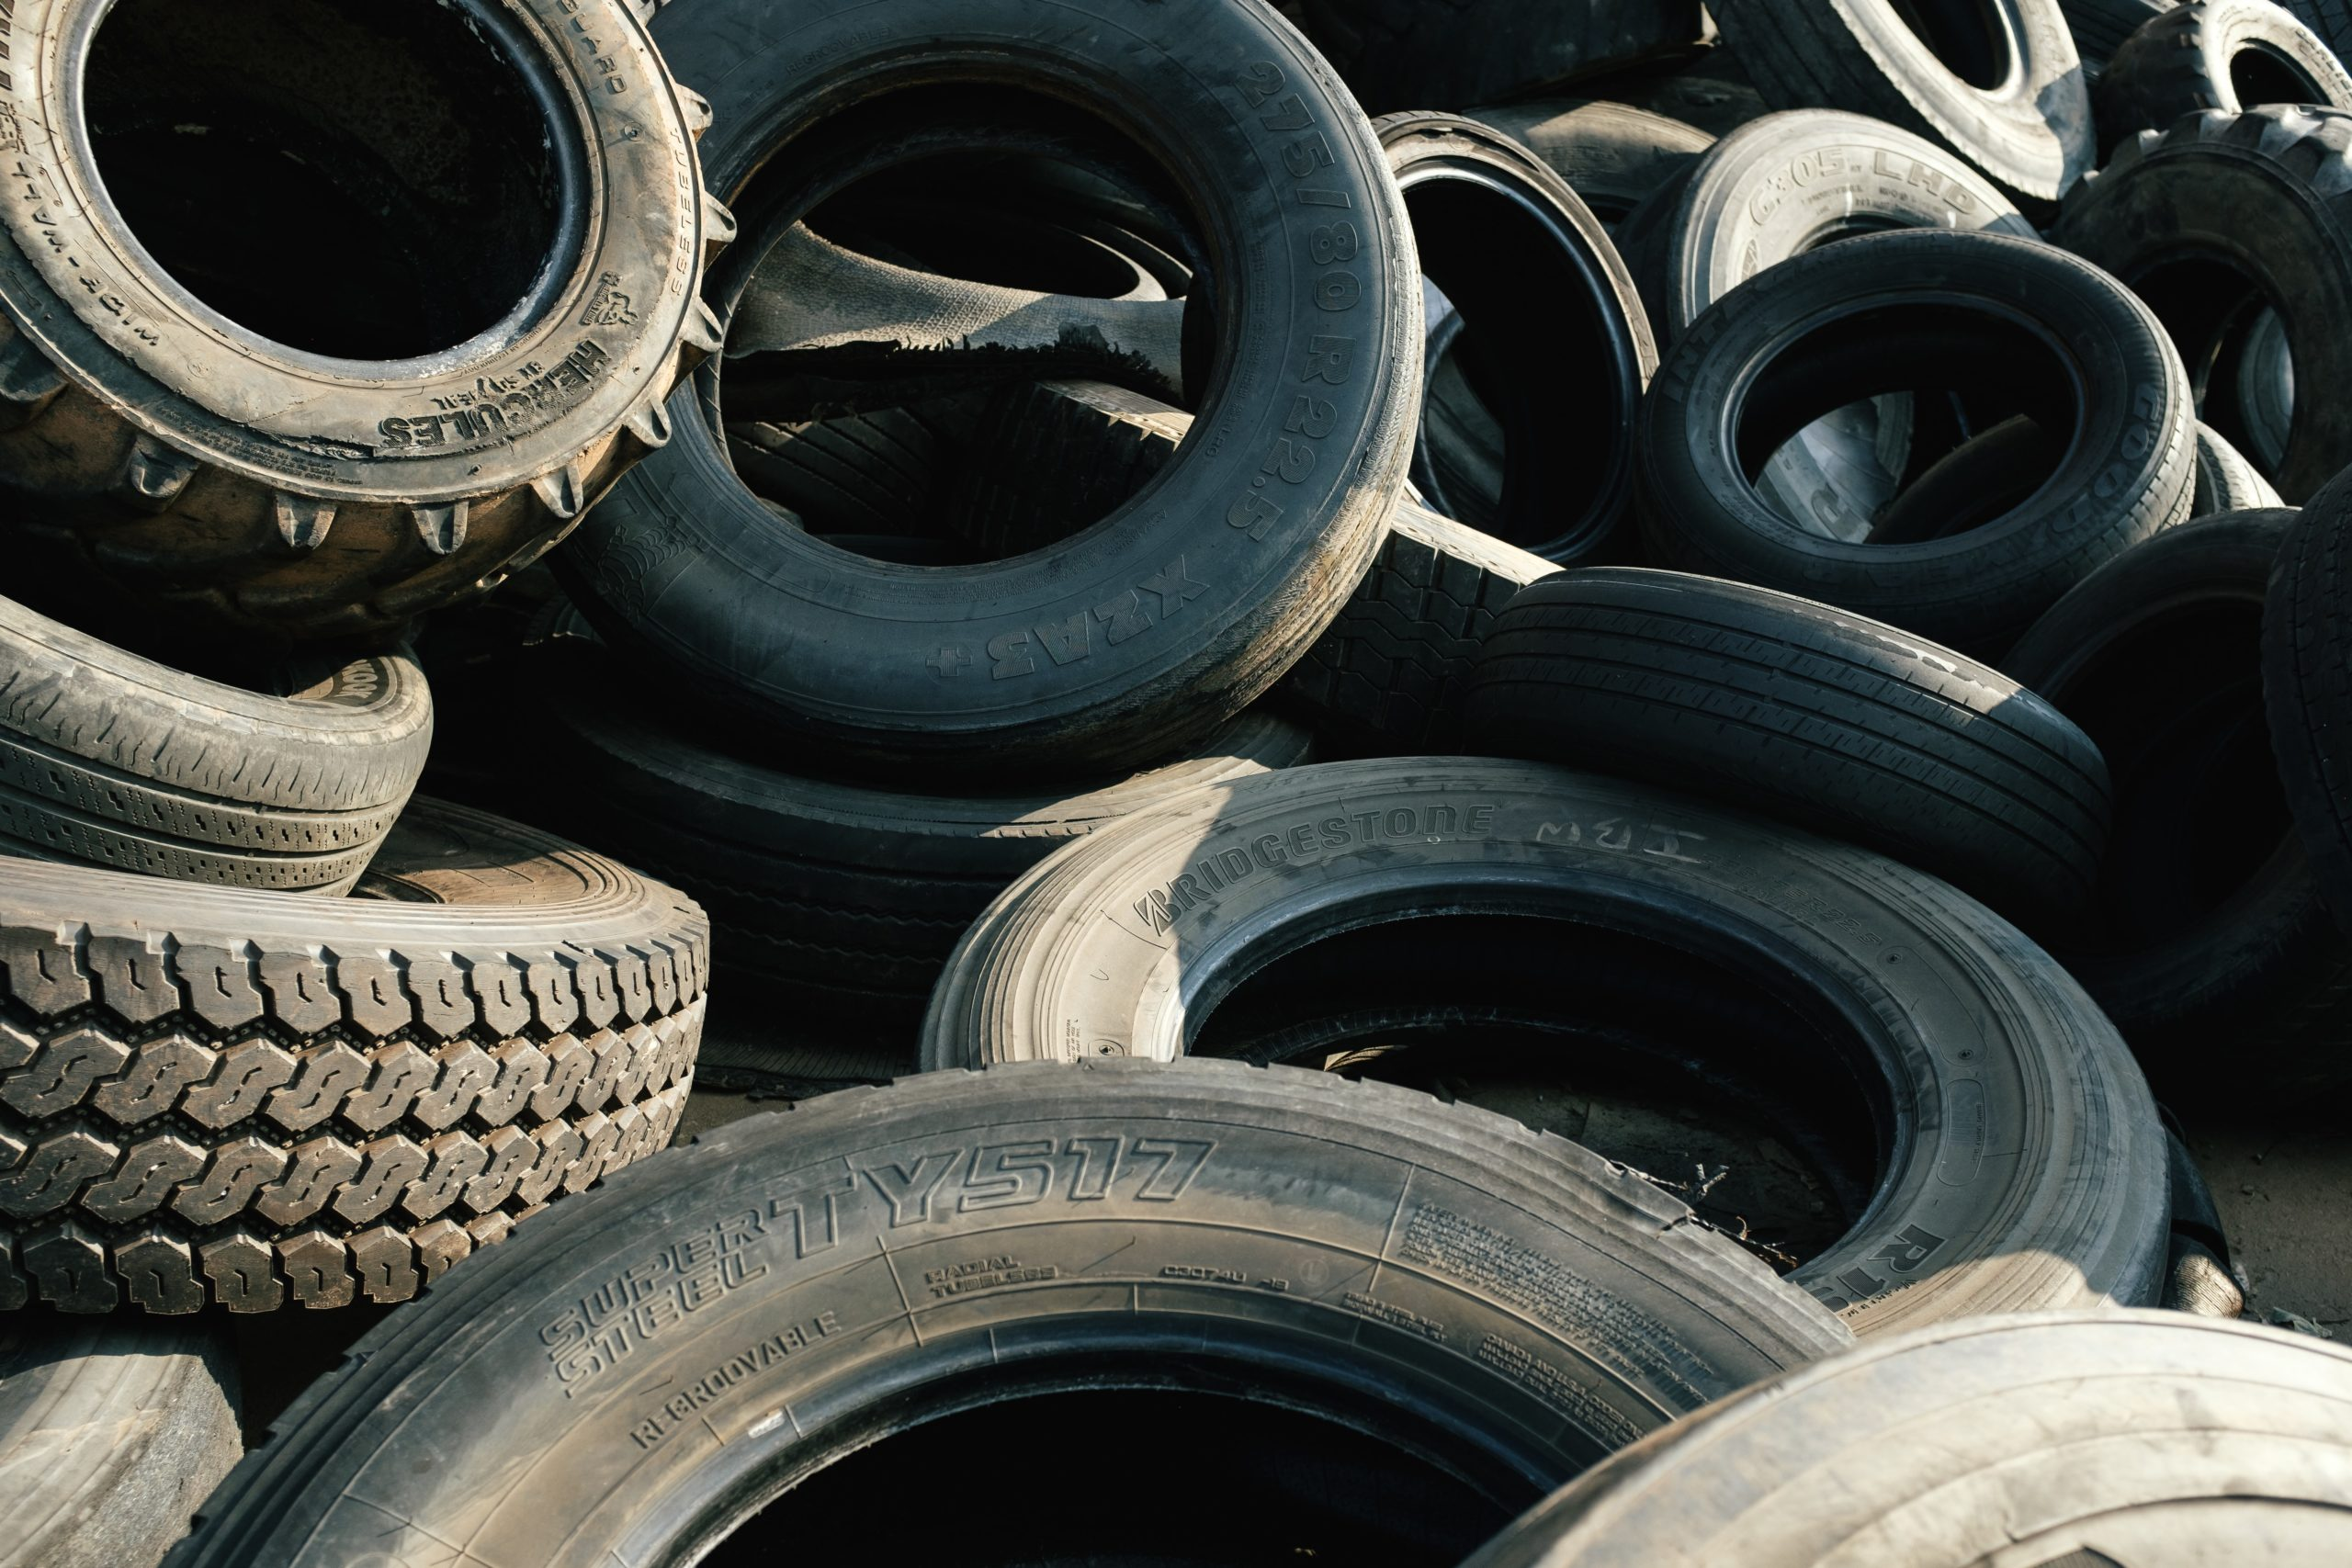 tires deflating